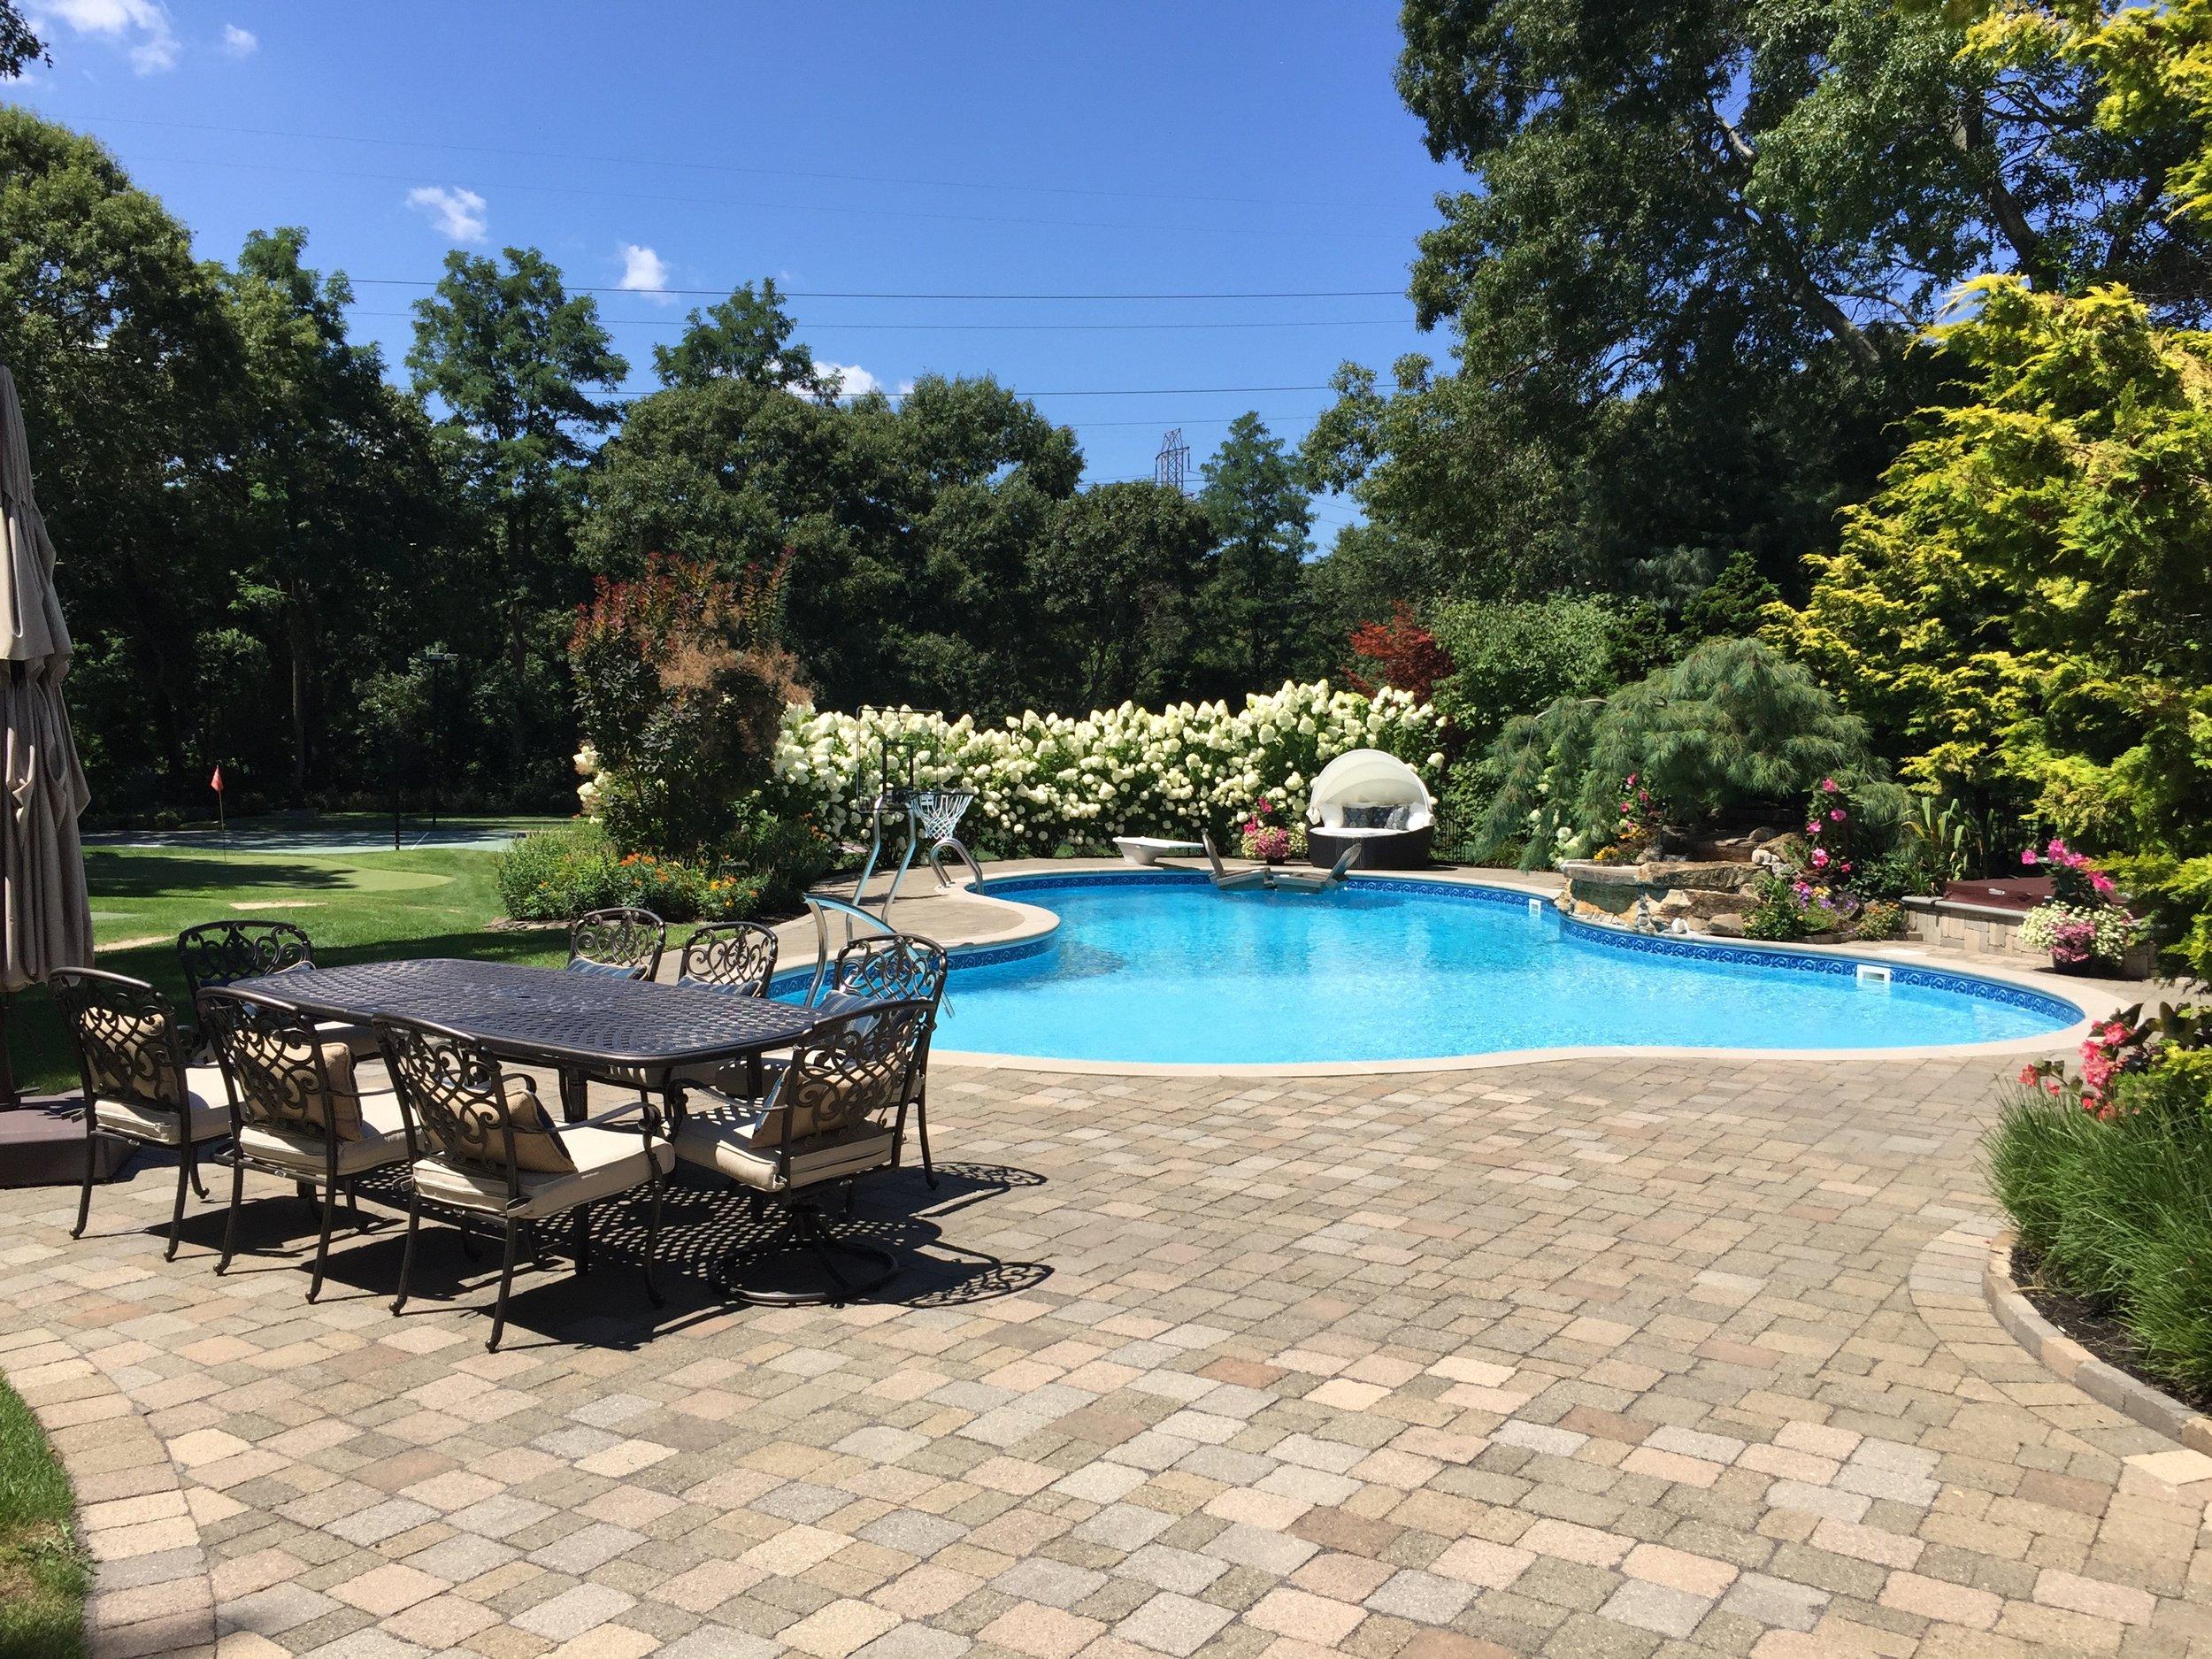 Professional pool patio paver company in Long Island, NY